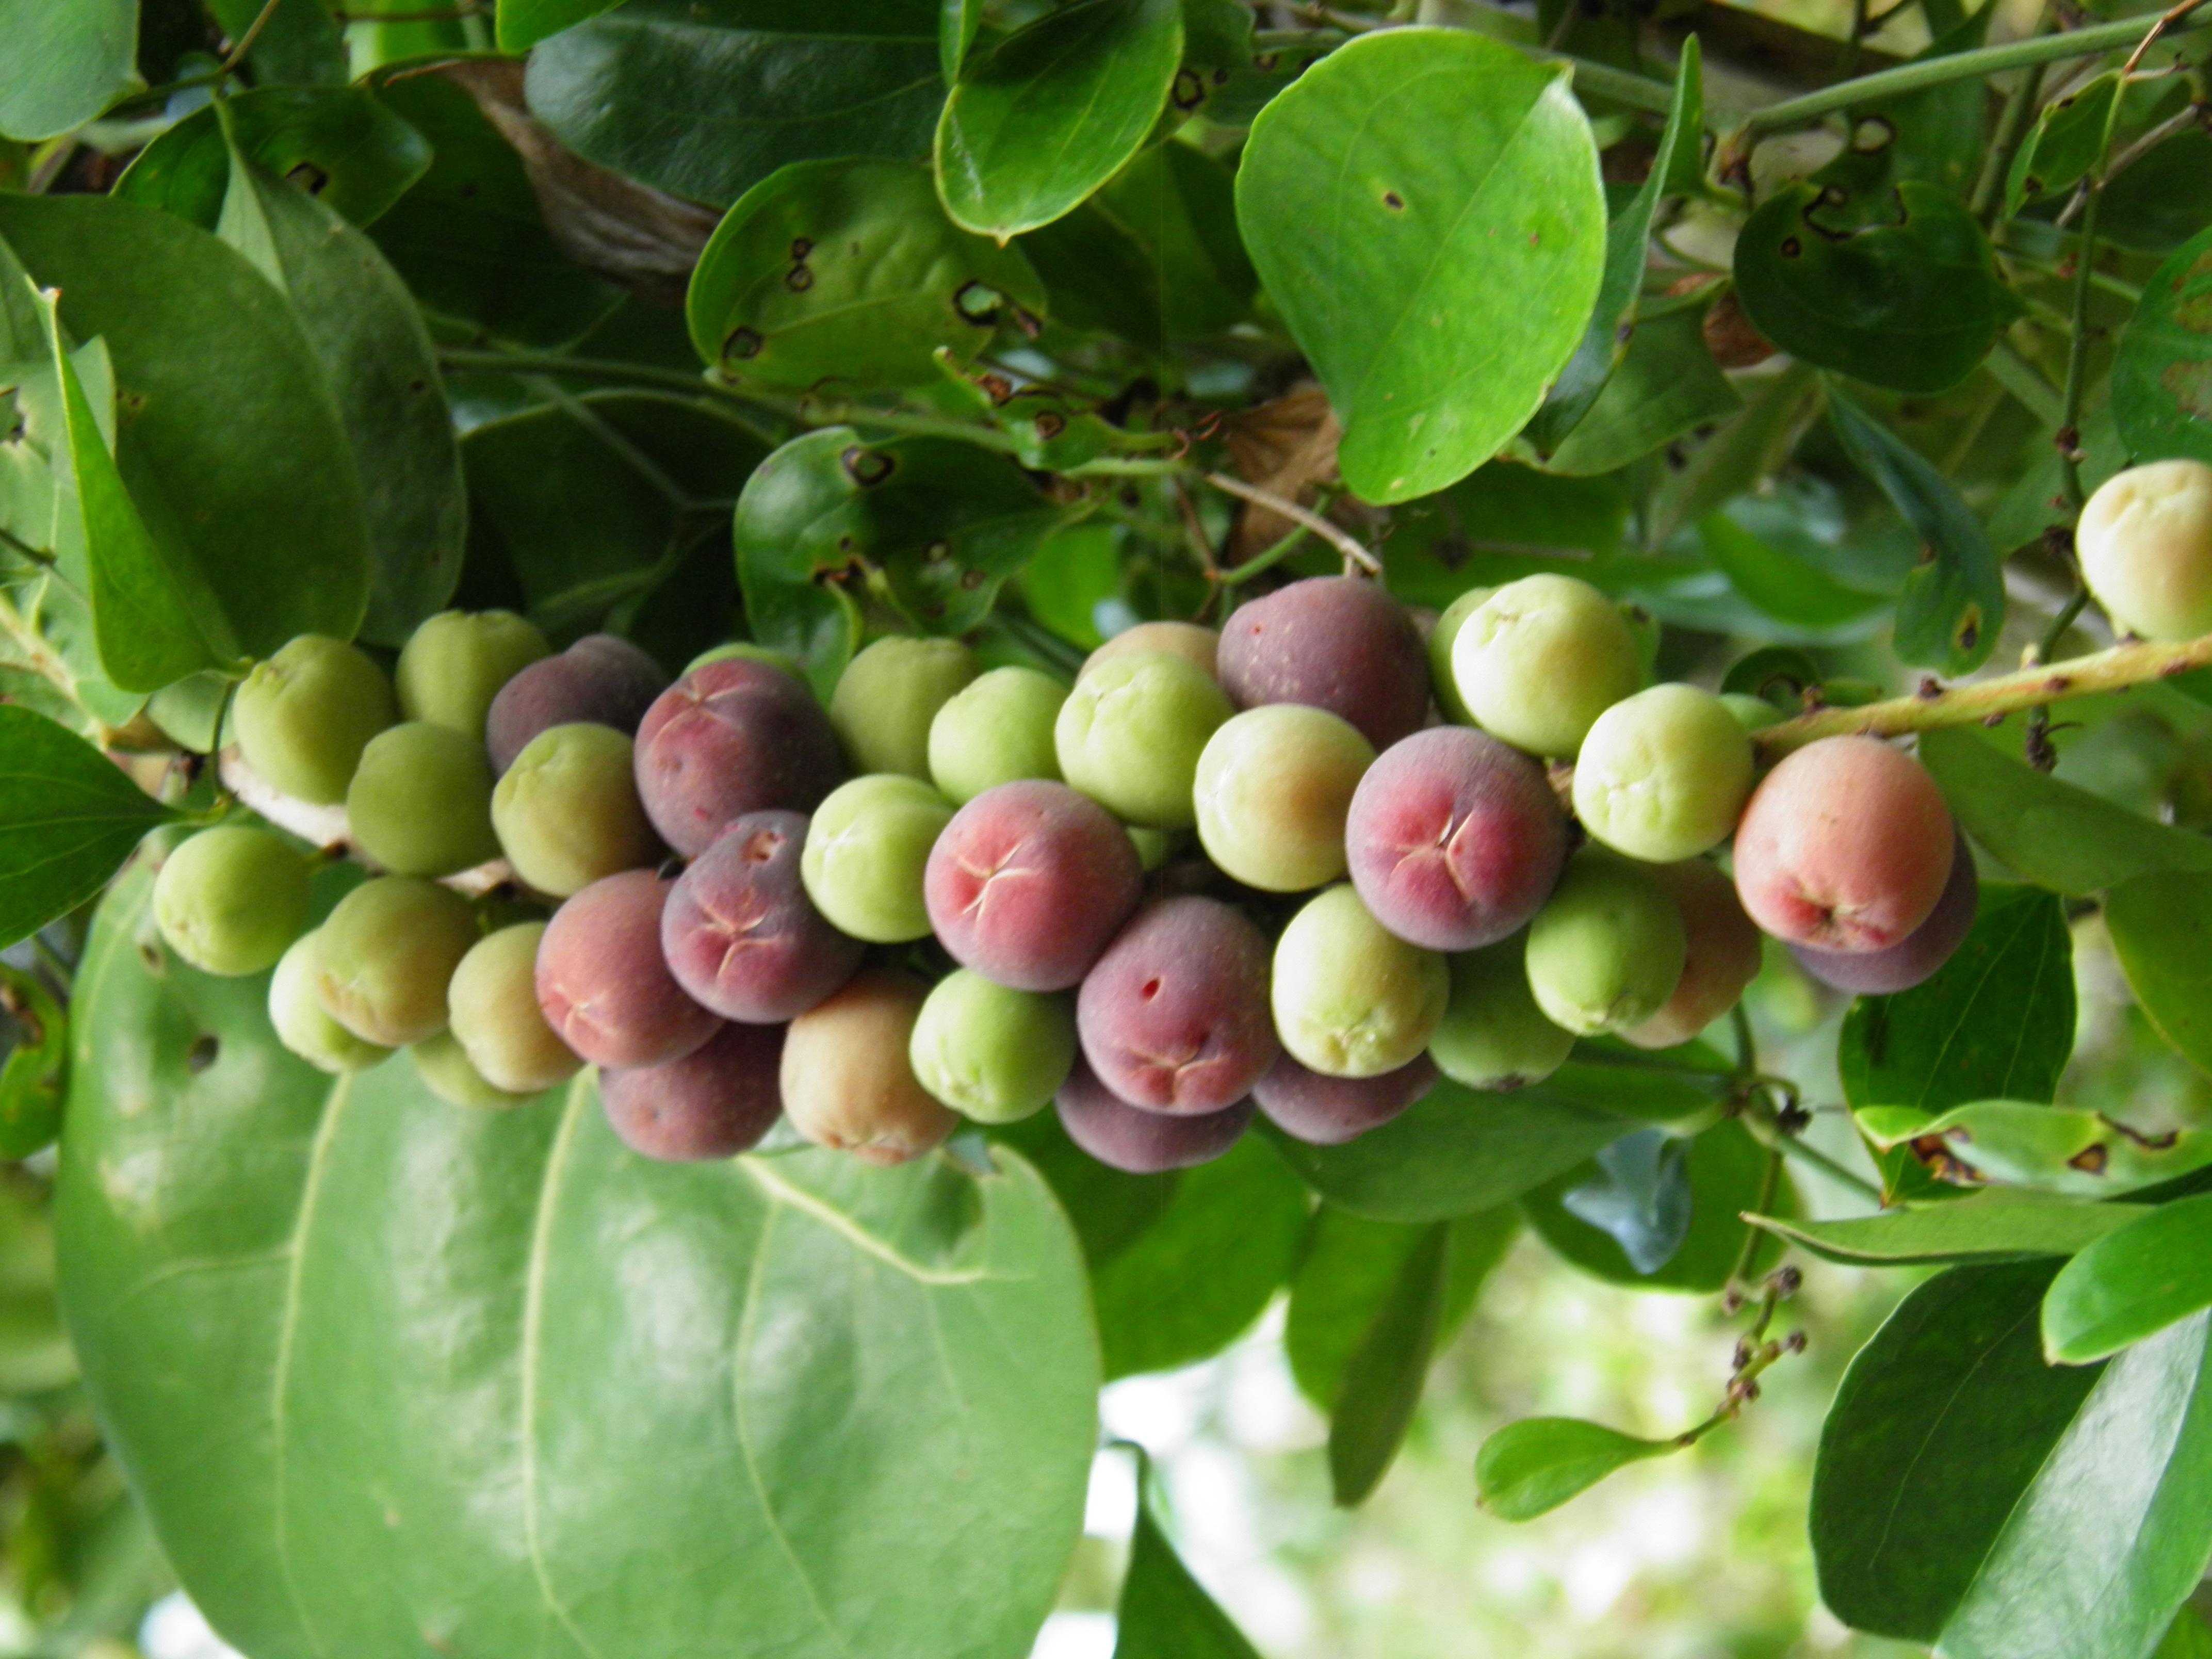 Prissy October South Lido Coccoloba Uvifera Florida Foraging Sea Grape Tree Fruit Edible Sea Grape Tree Wikipedia houzz 01 Sea Grape Tree